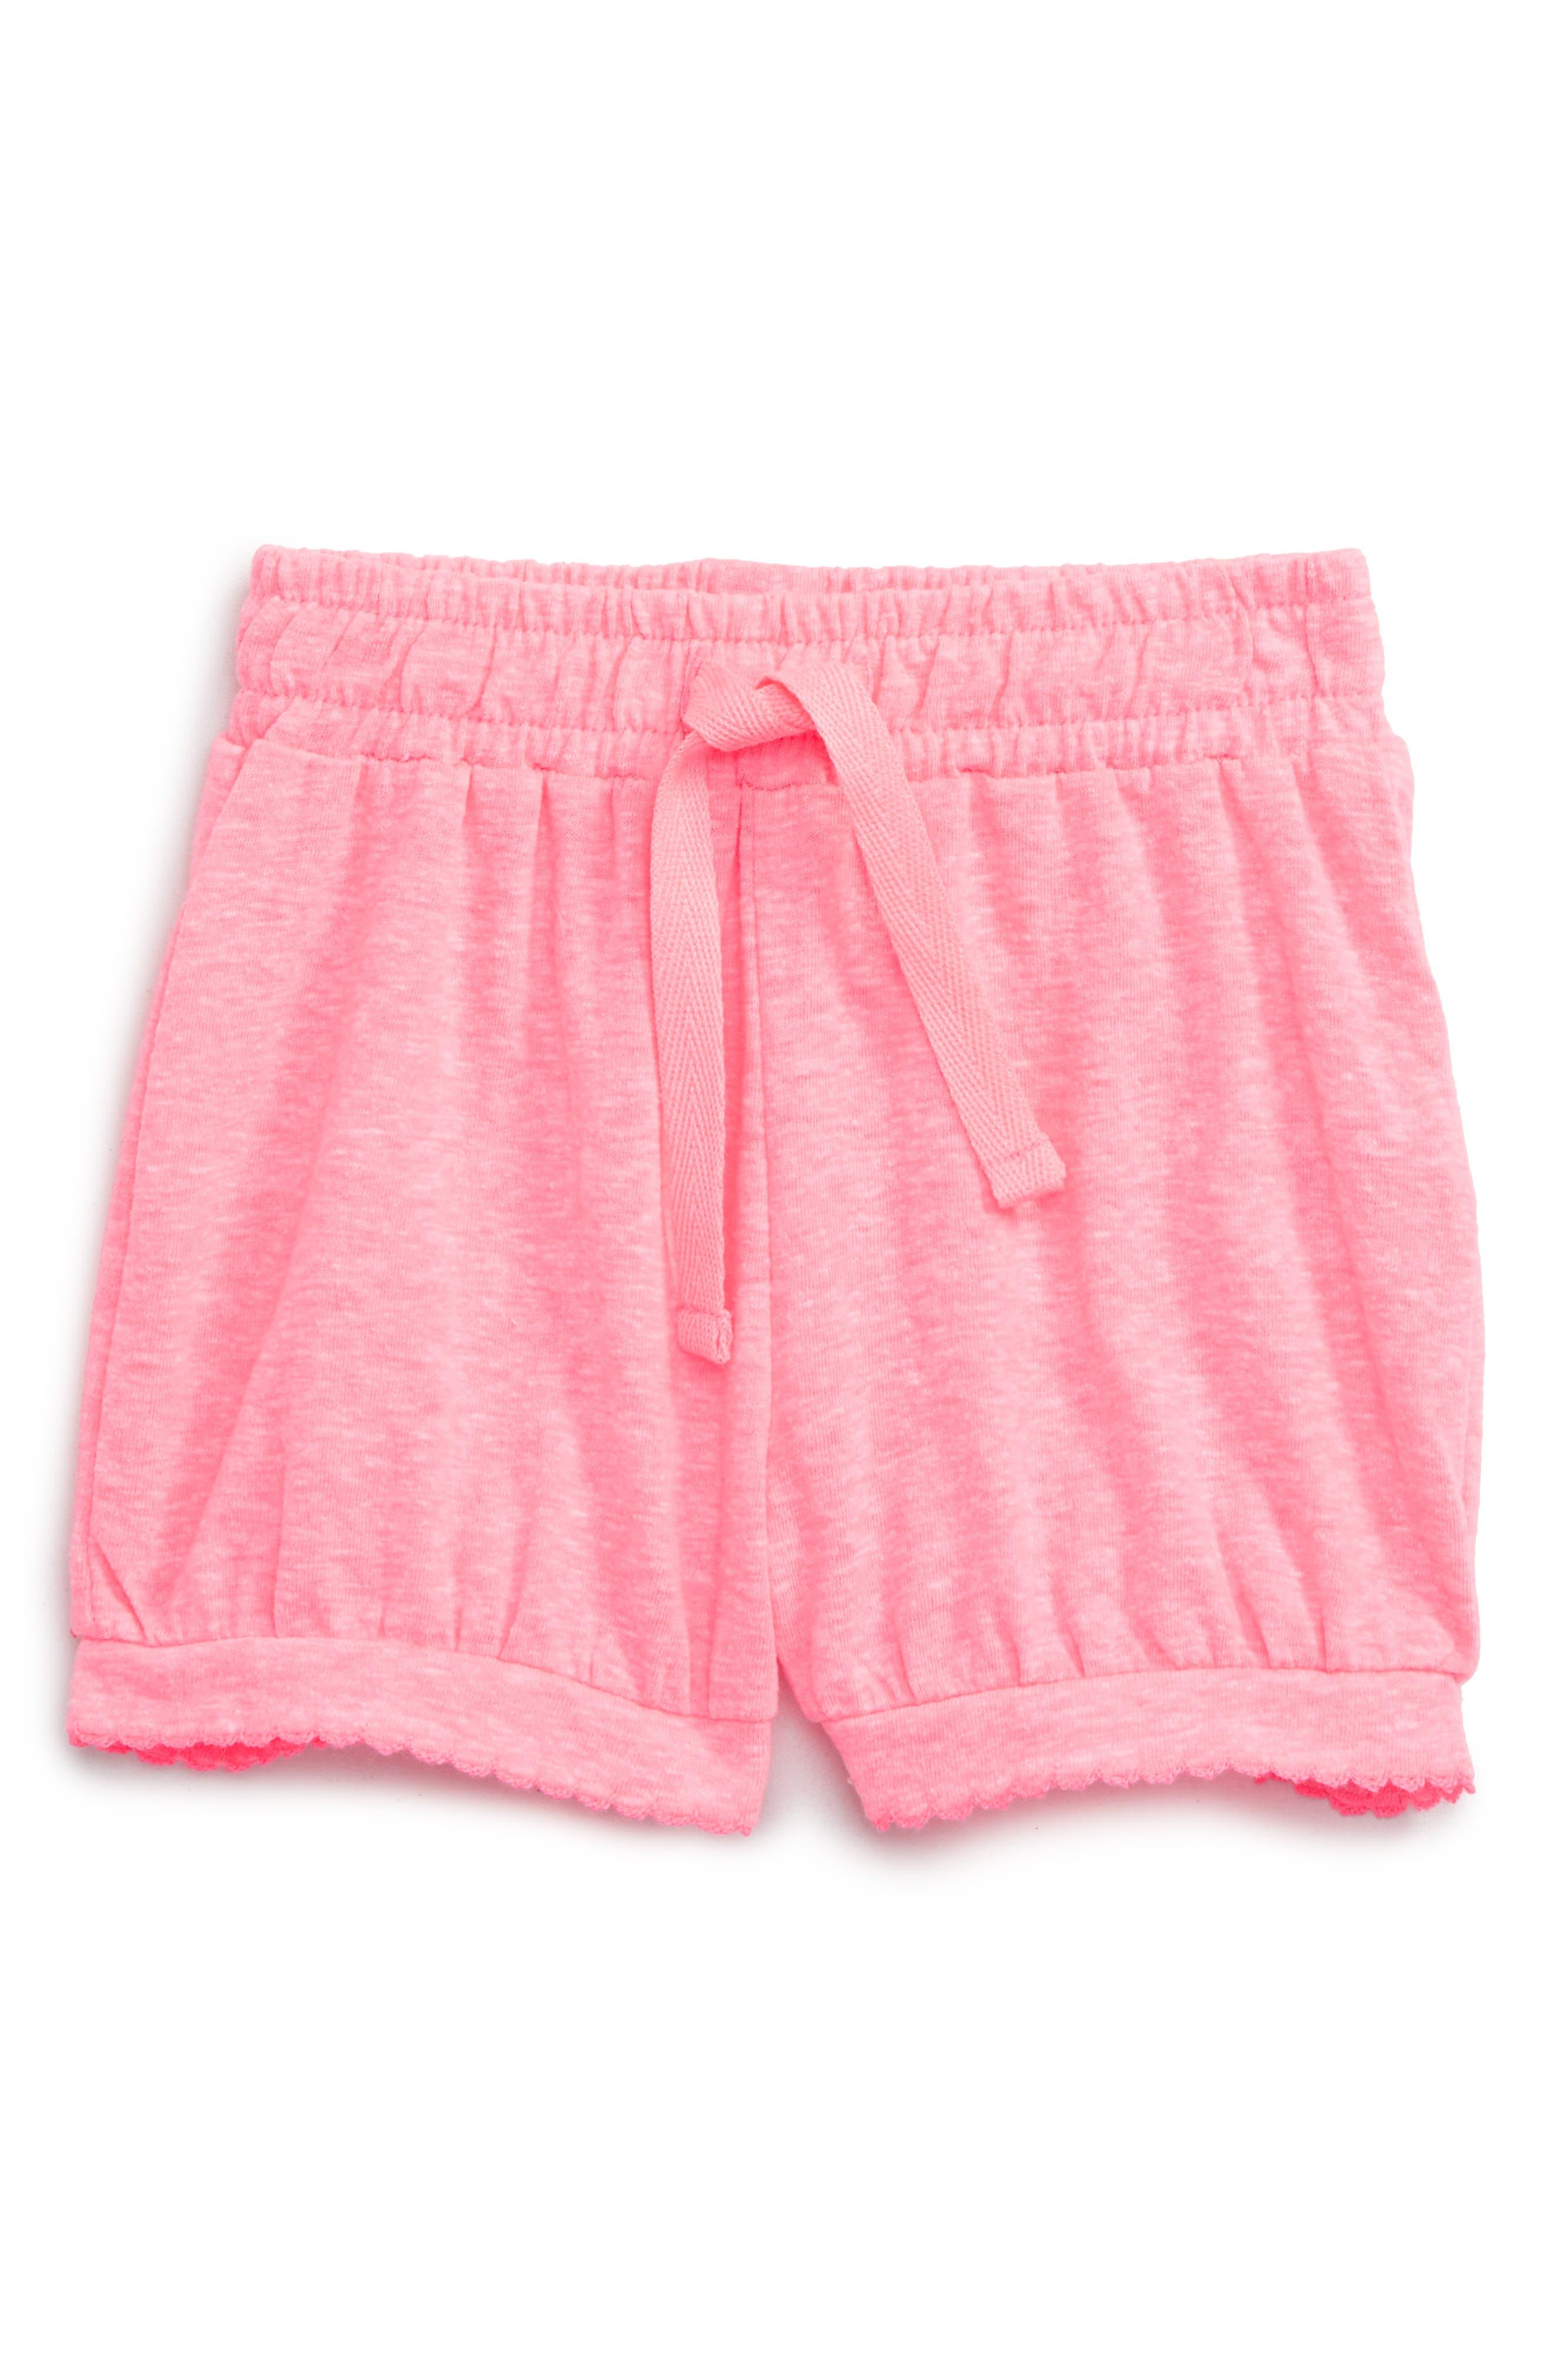 TUCKER + TATE Essential Shorts